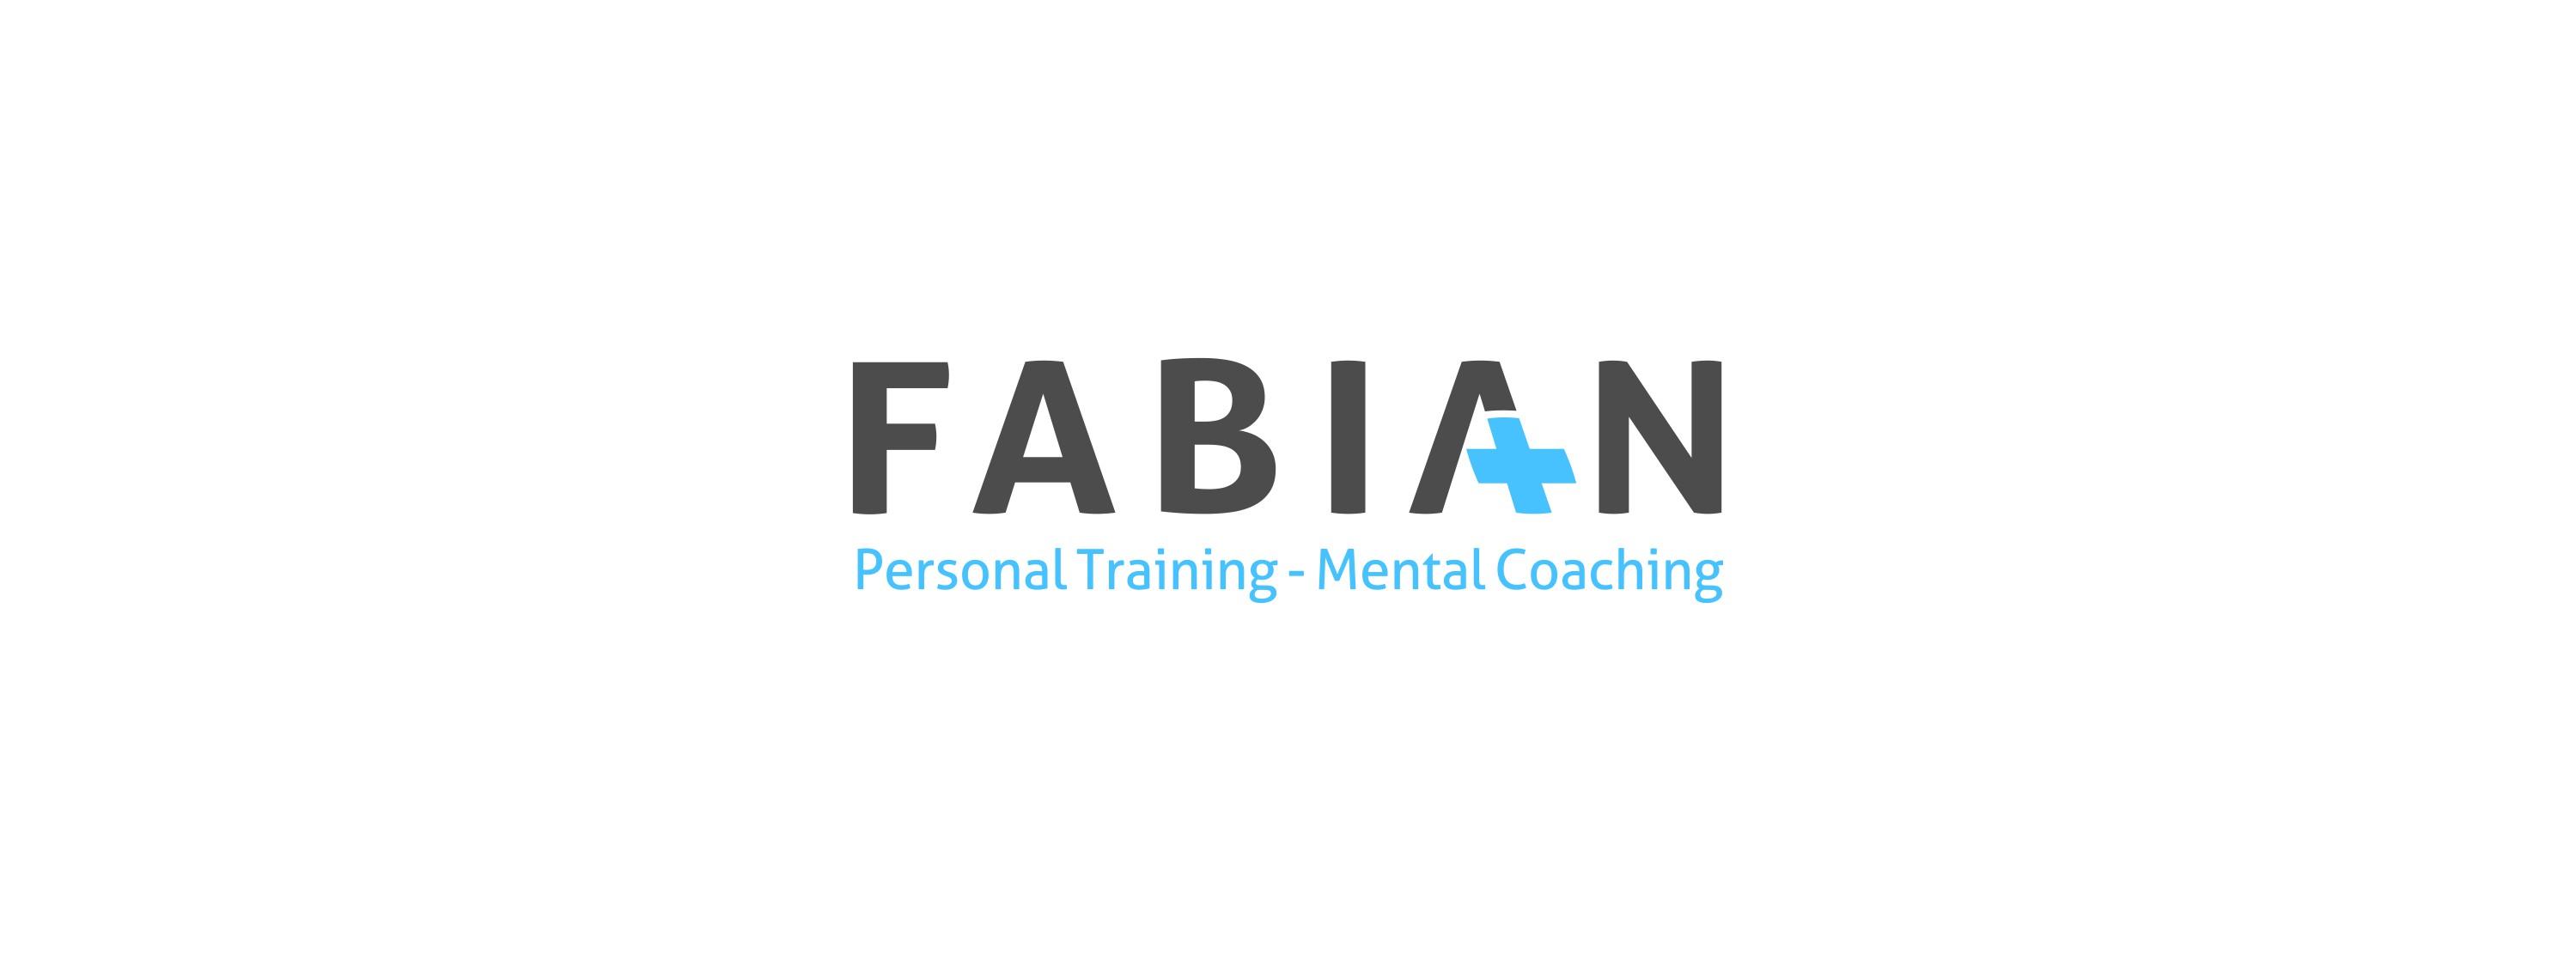 New Logo for my Premium Personal Training & Coaching Brand